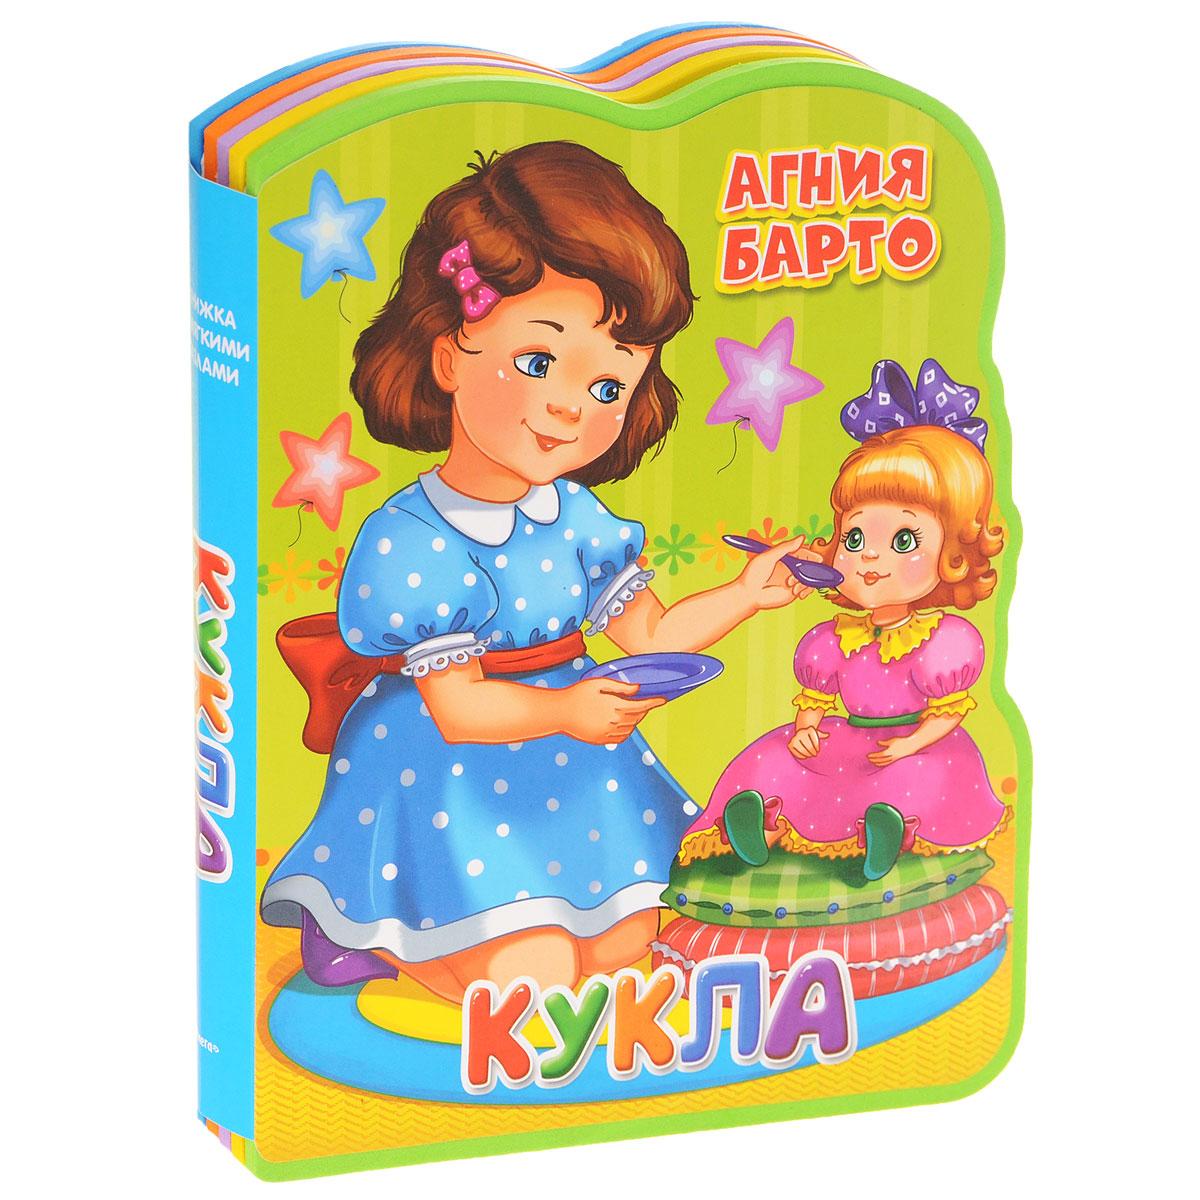 Кукла. Книжка-игрушка, Агния Барто